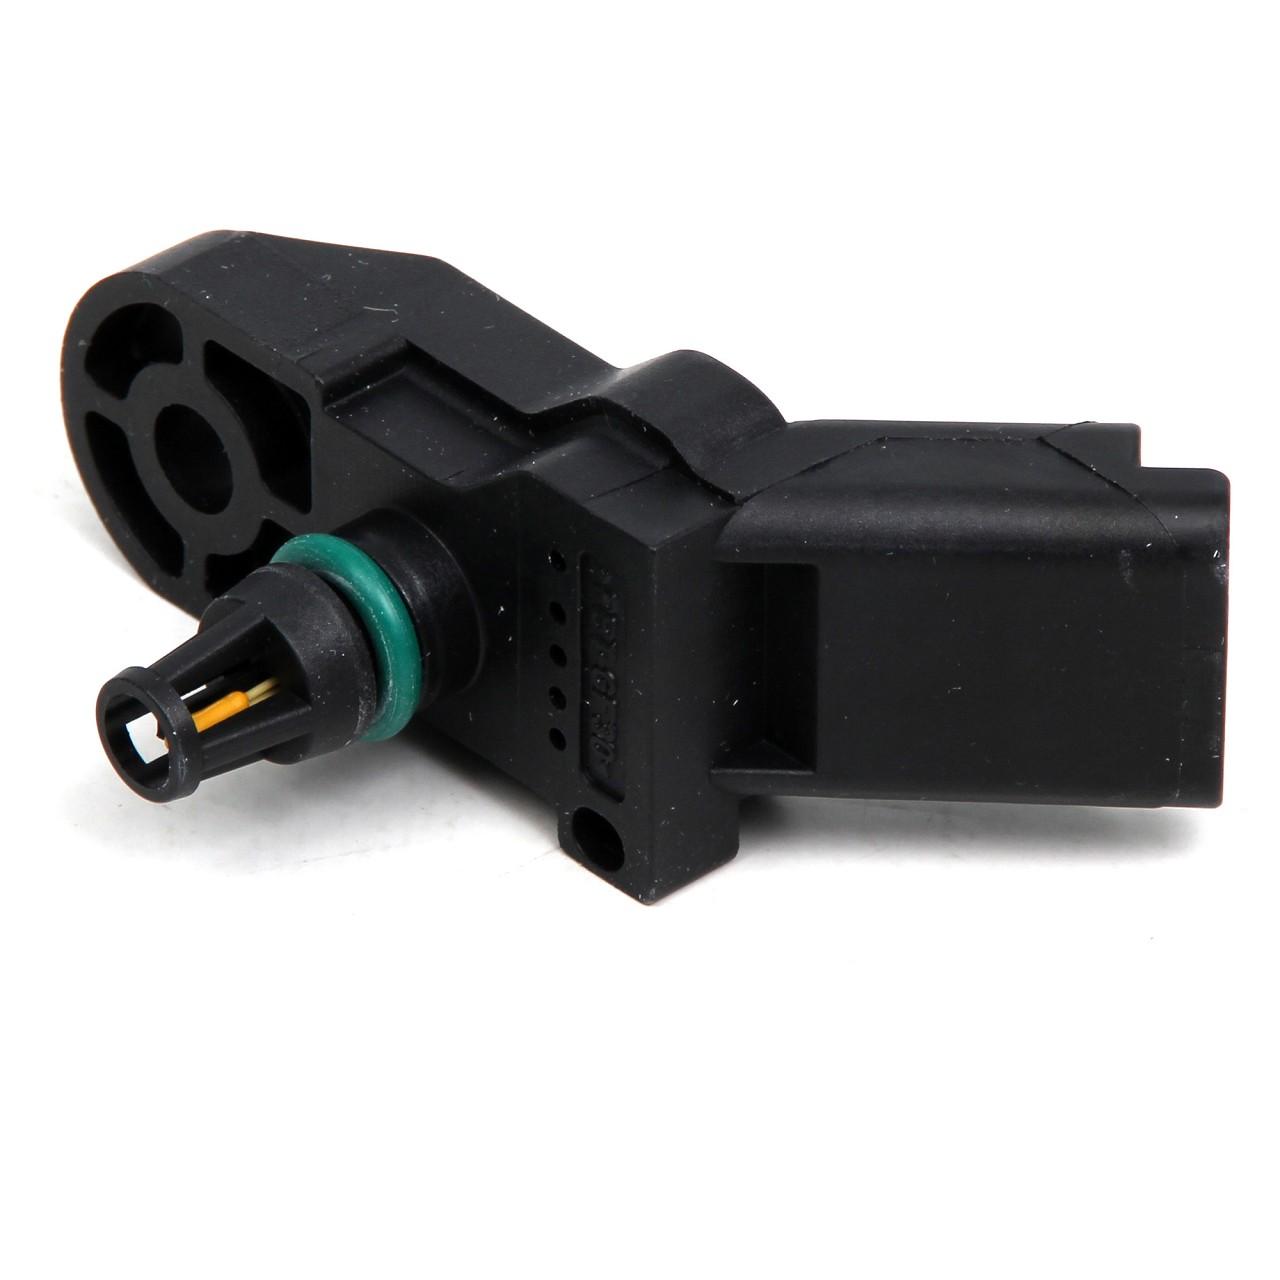 ORIGINAL Citroen Peugeot Saugdrucksensor Sensor Saugrohrdruck 9639381480